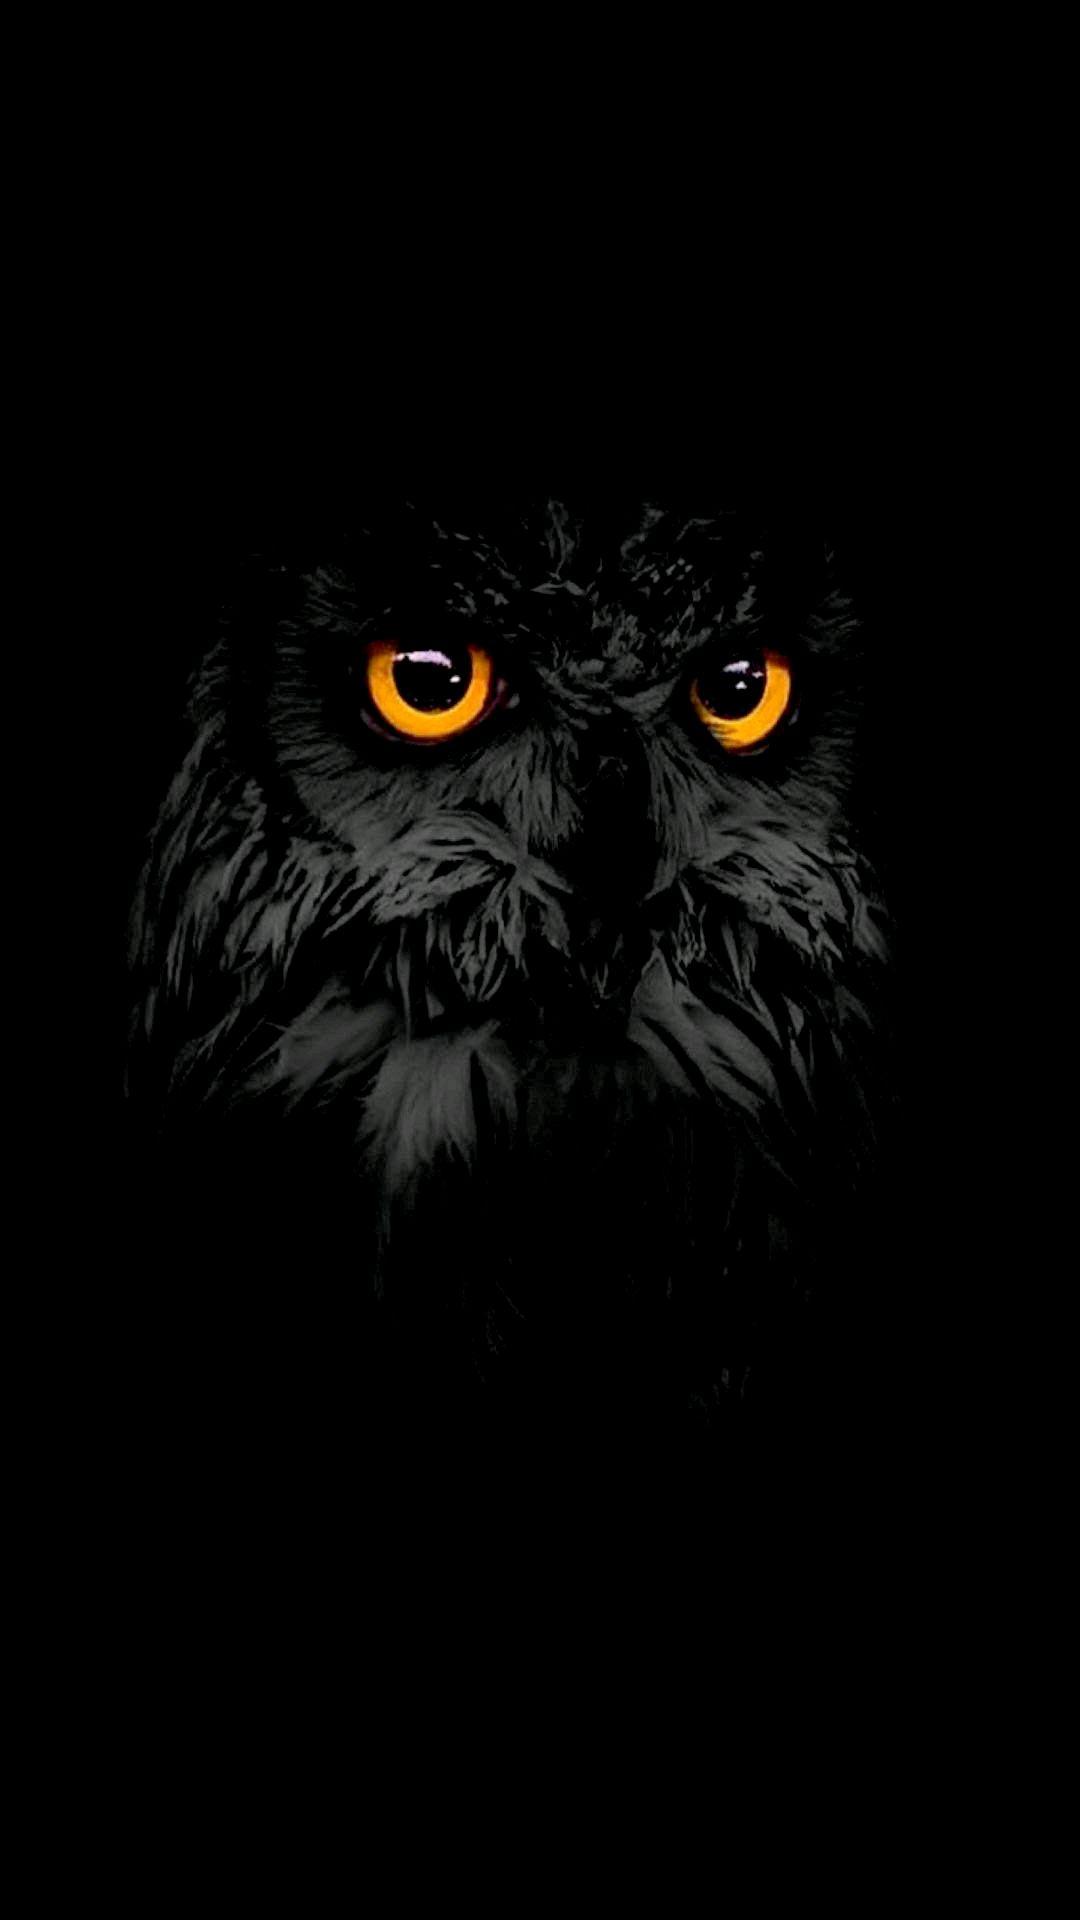 Black Owl Eyes iPhone Wallpaper